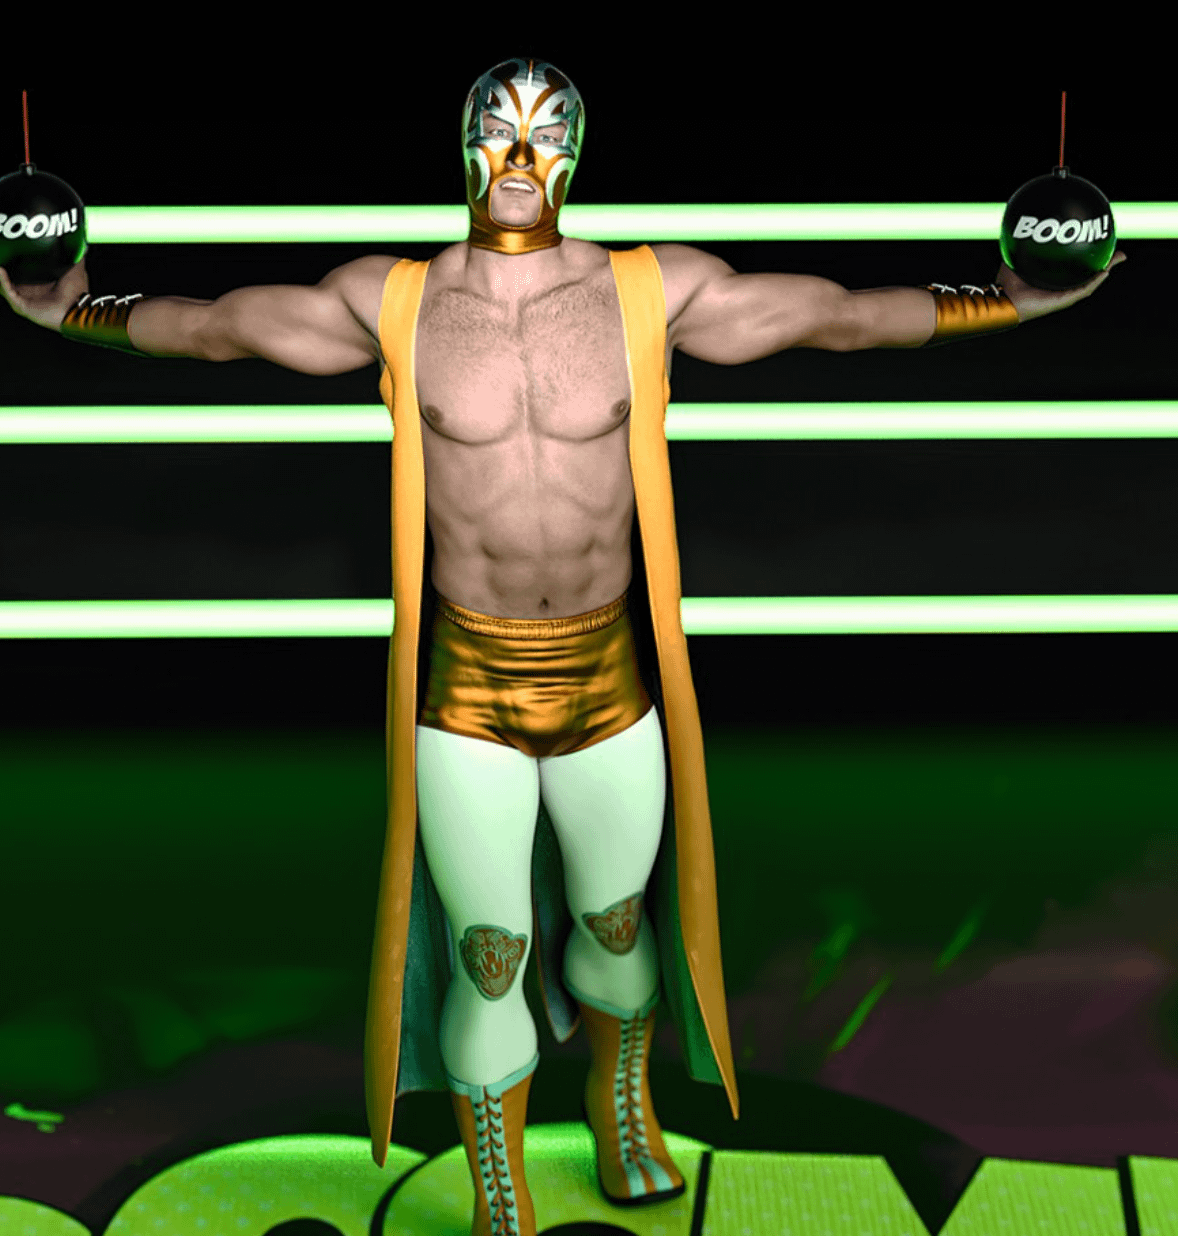 dforce luchador wrestling outfit